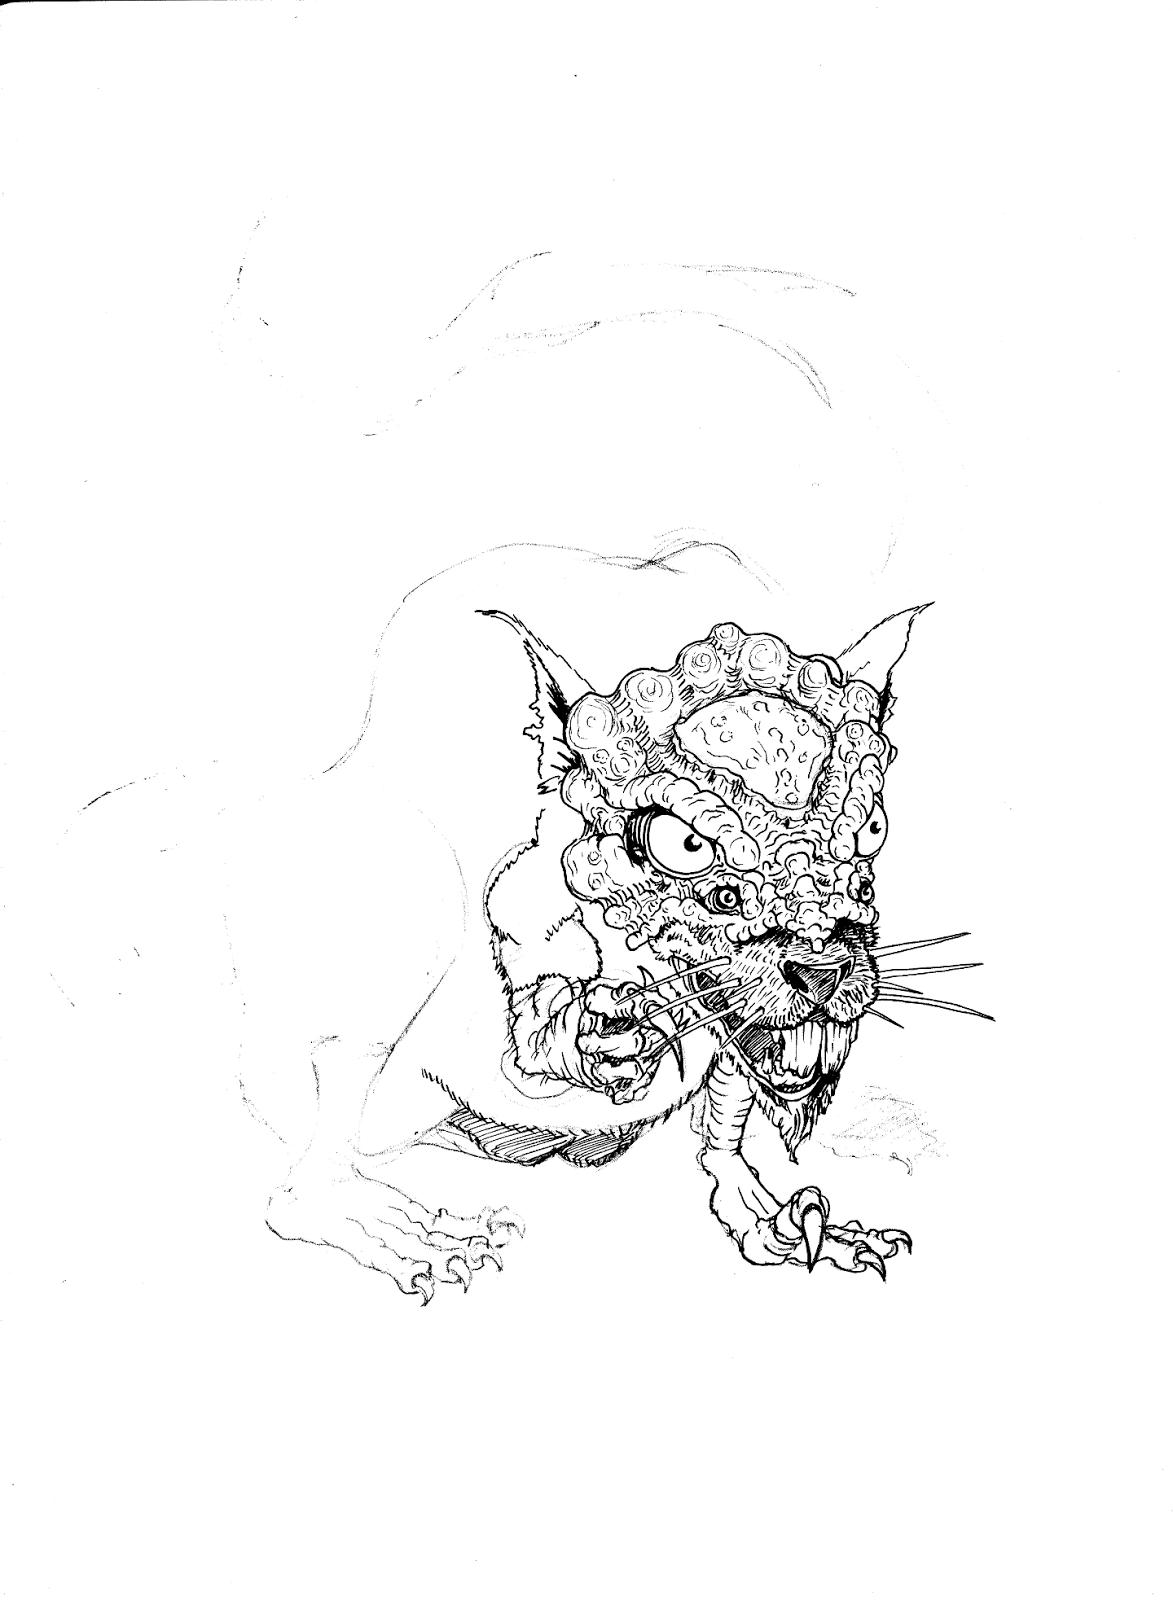 Hesaki Rat WIP by Del Teigeler, Mavfire